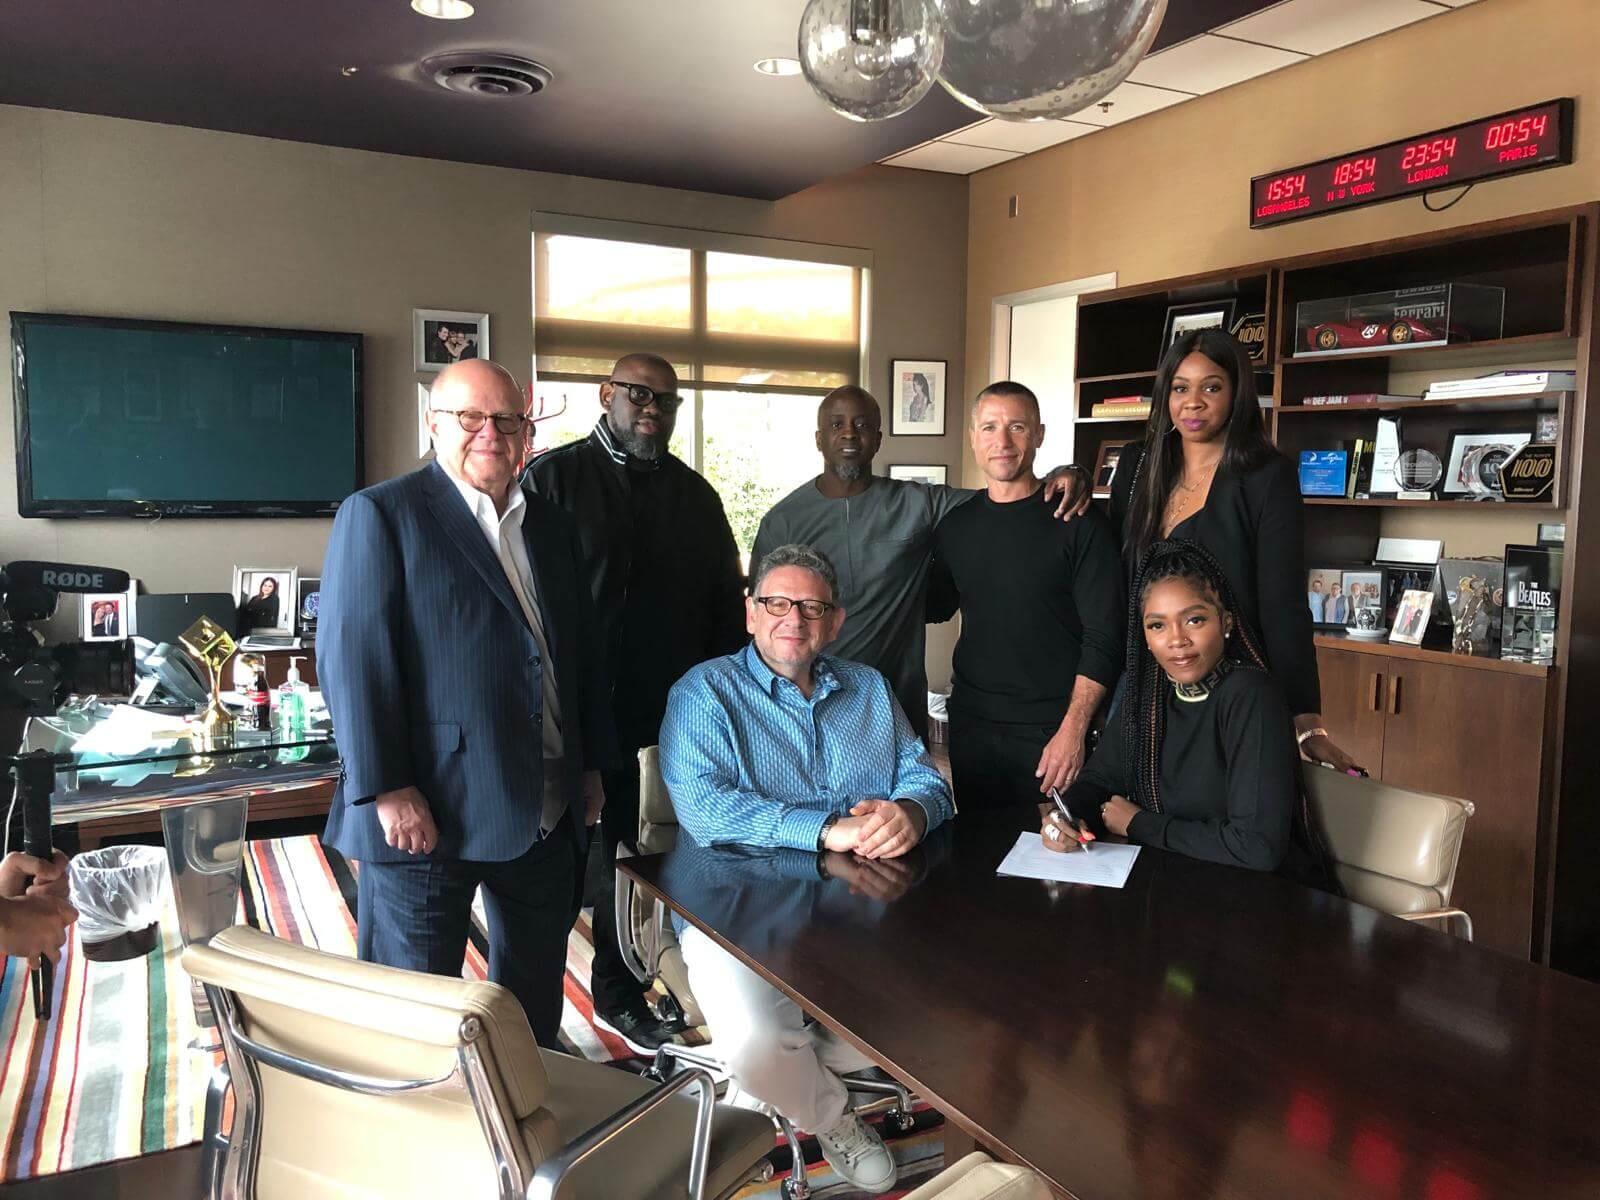 Tiwa Savage signing new deal at UMG office